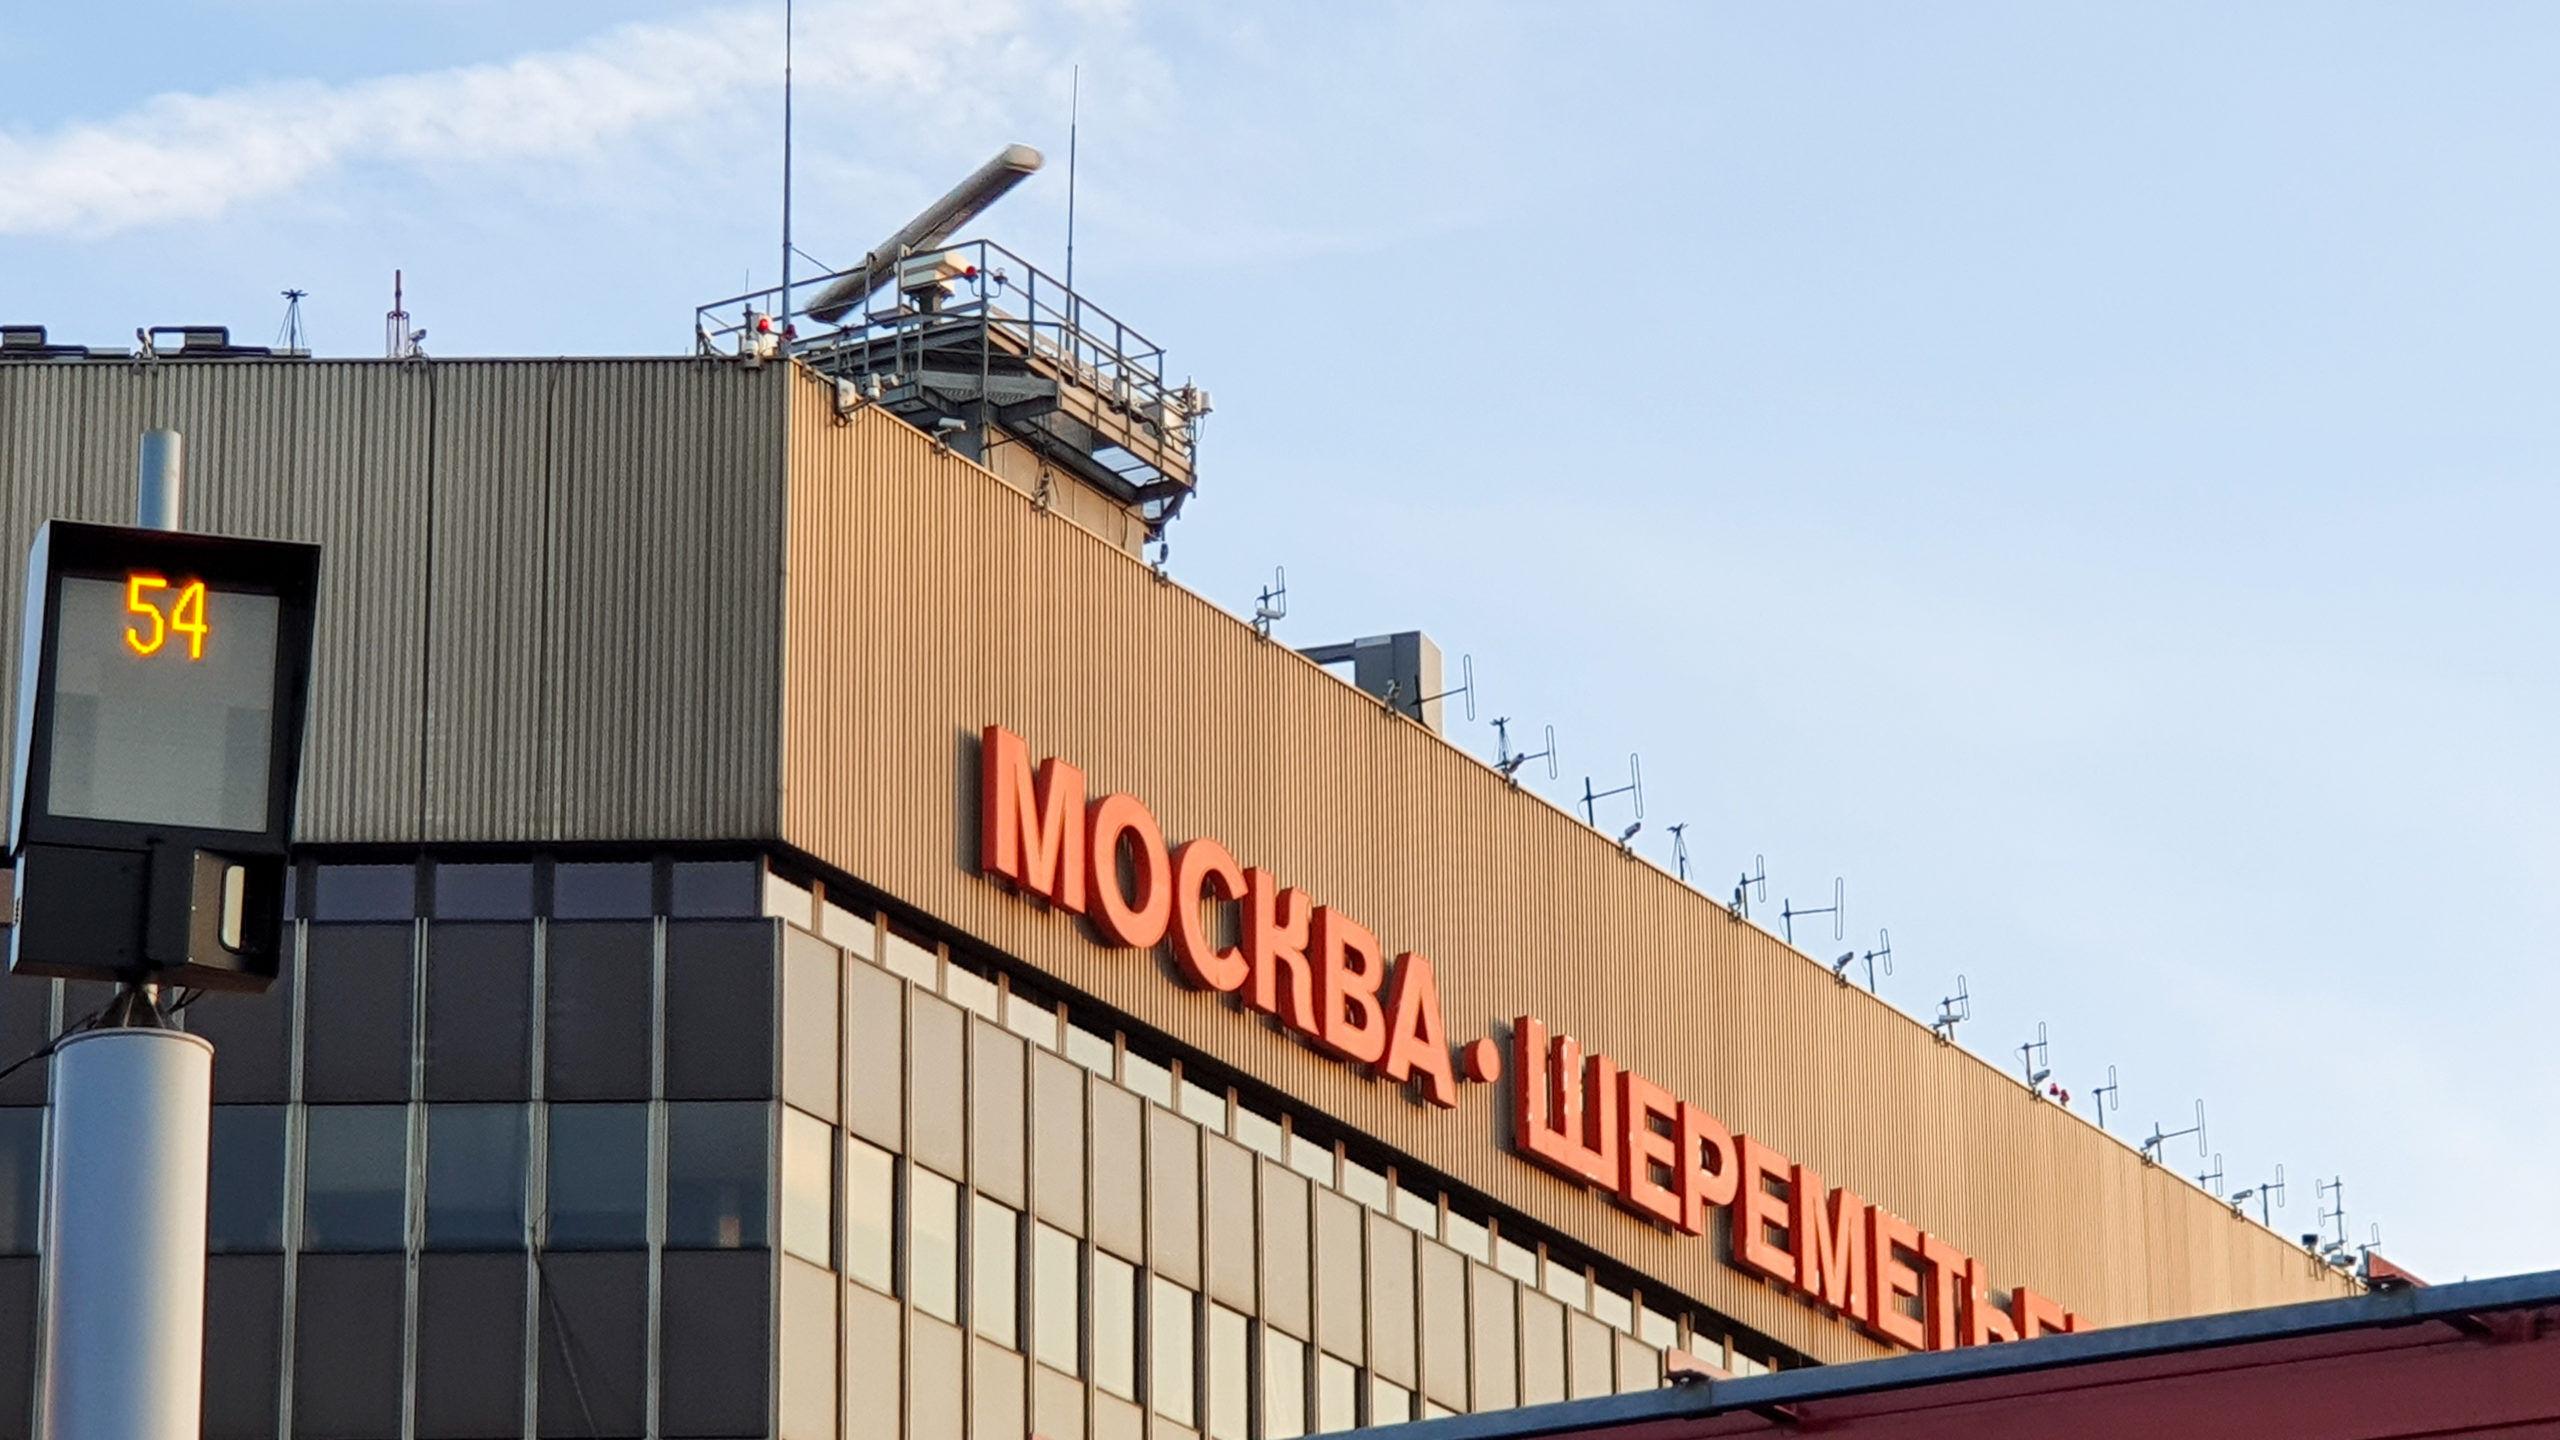 Aéroport de Moscou-Cheremetievo Aeroflot